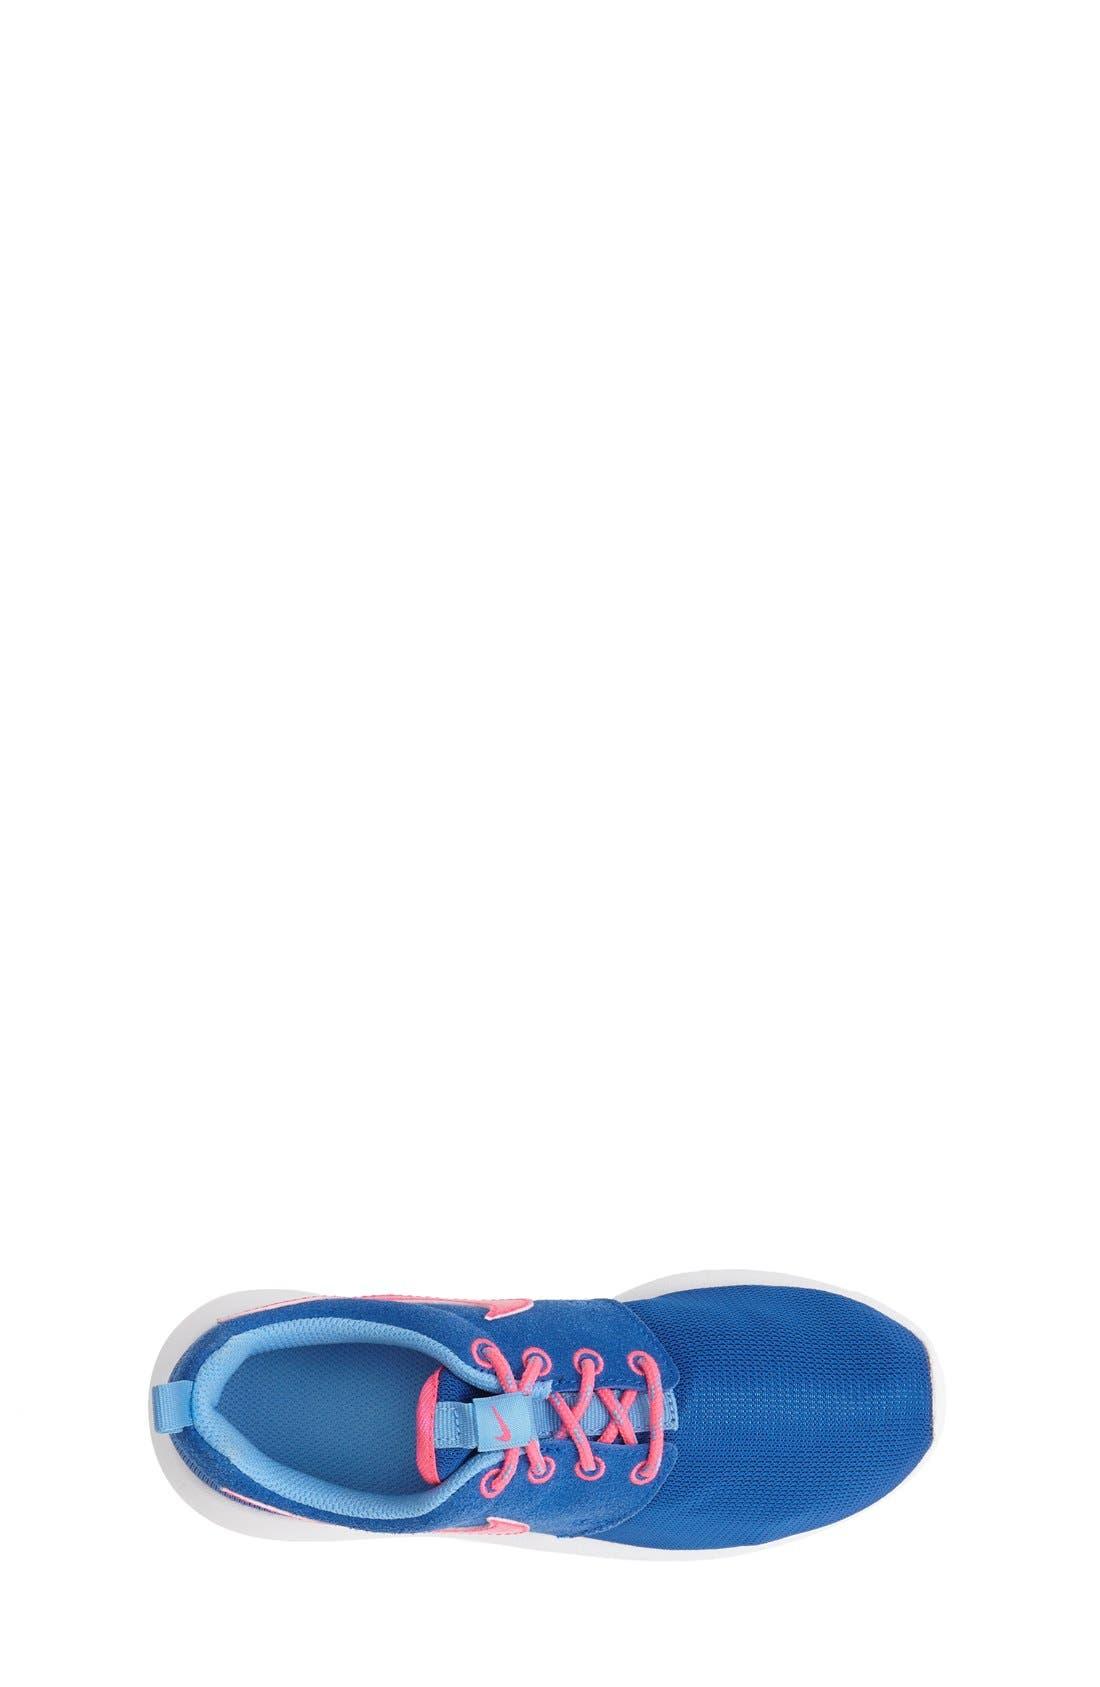 'Roshe Run' Athletic Shoe,                             Alternate thumbnail 130, color,